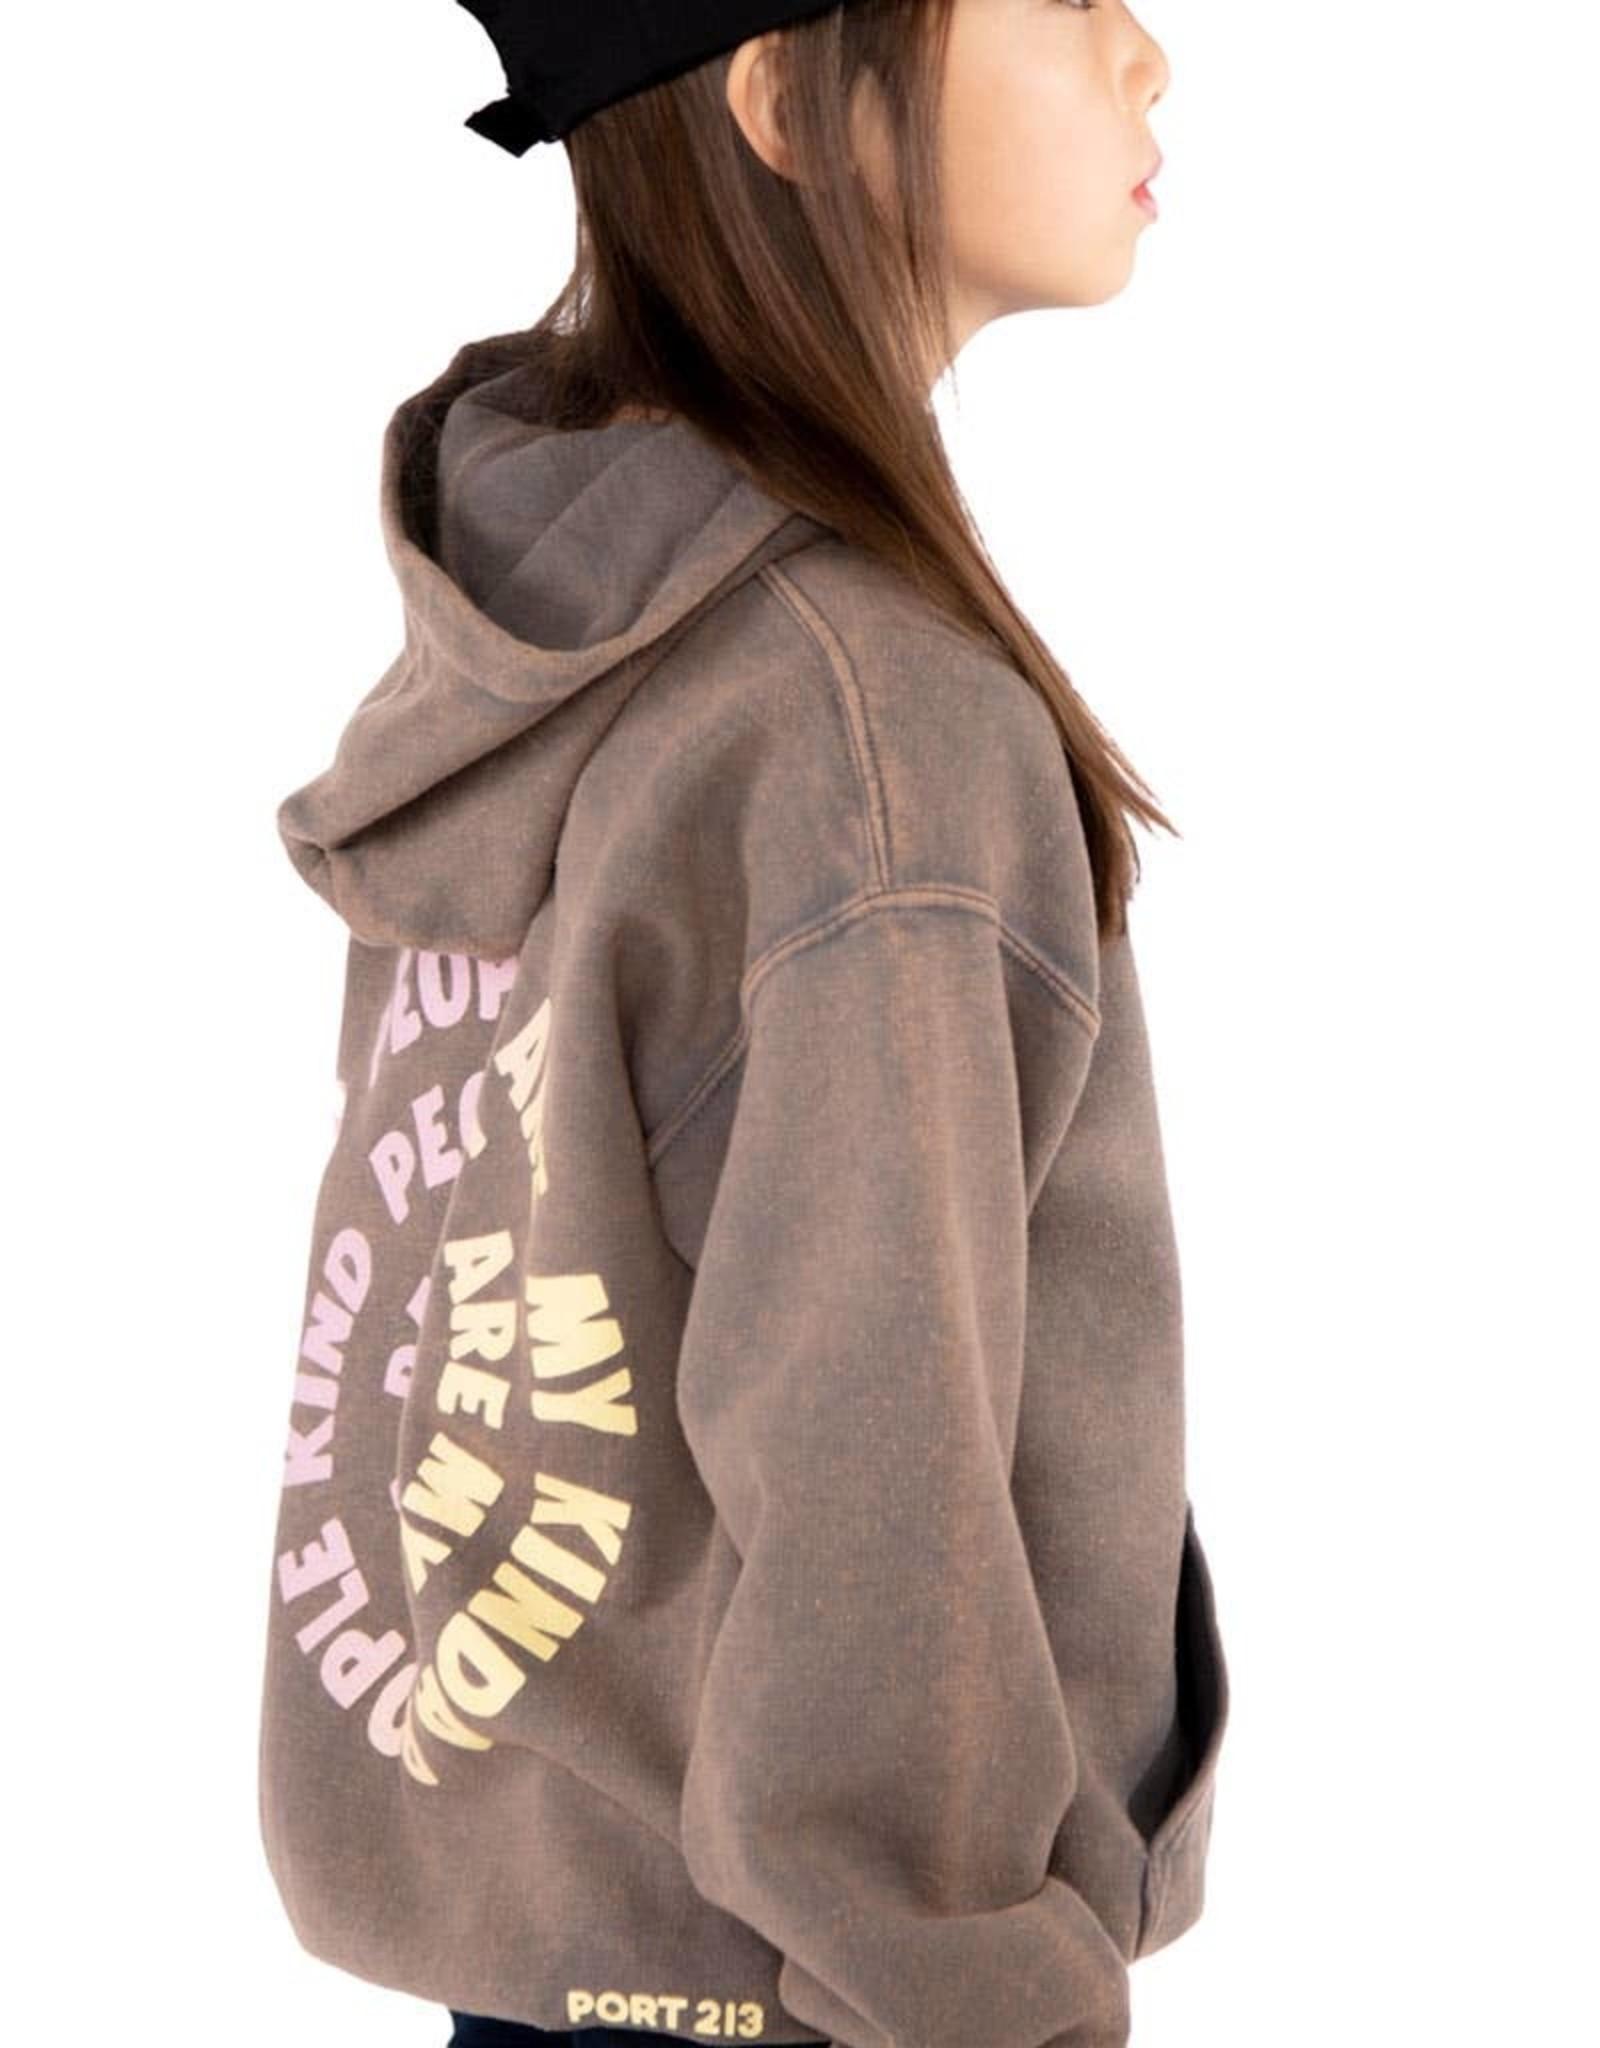 Port 213 kind people hoodie